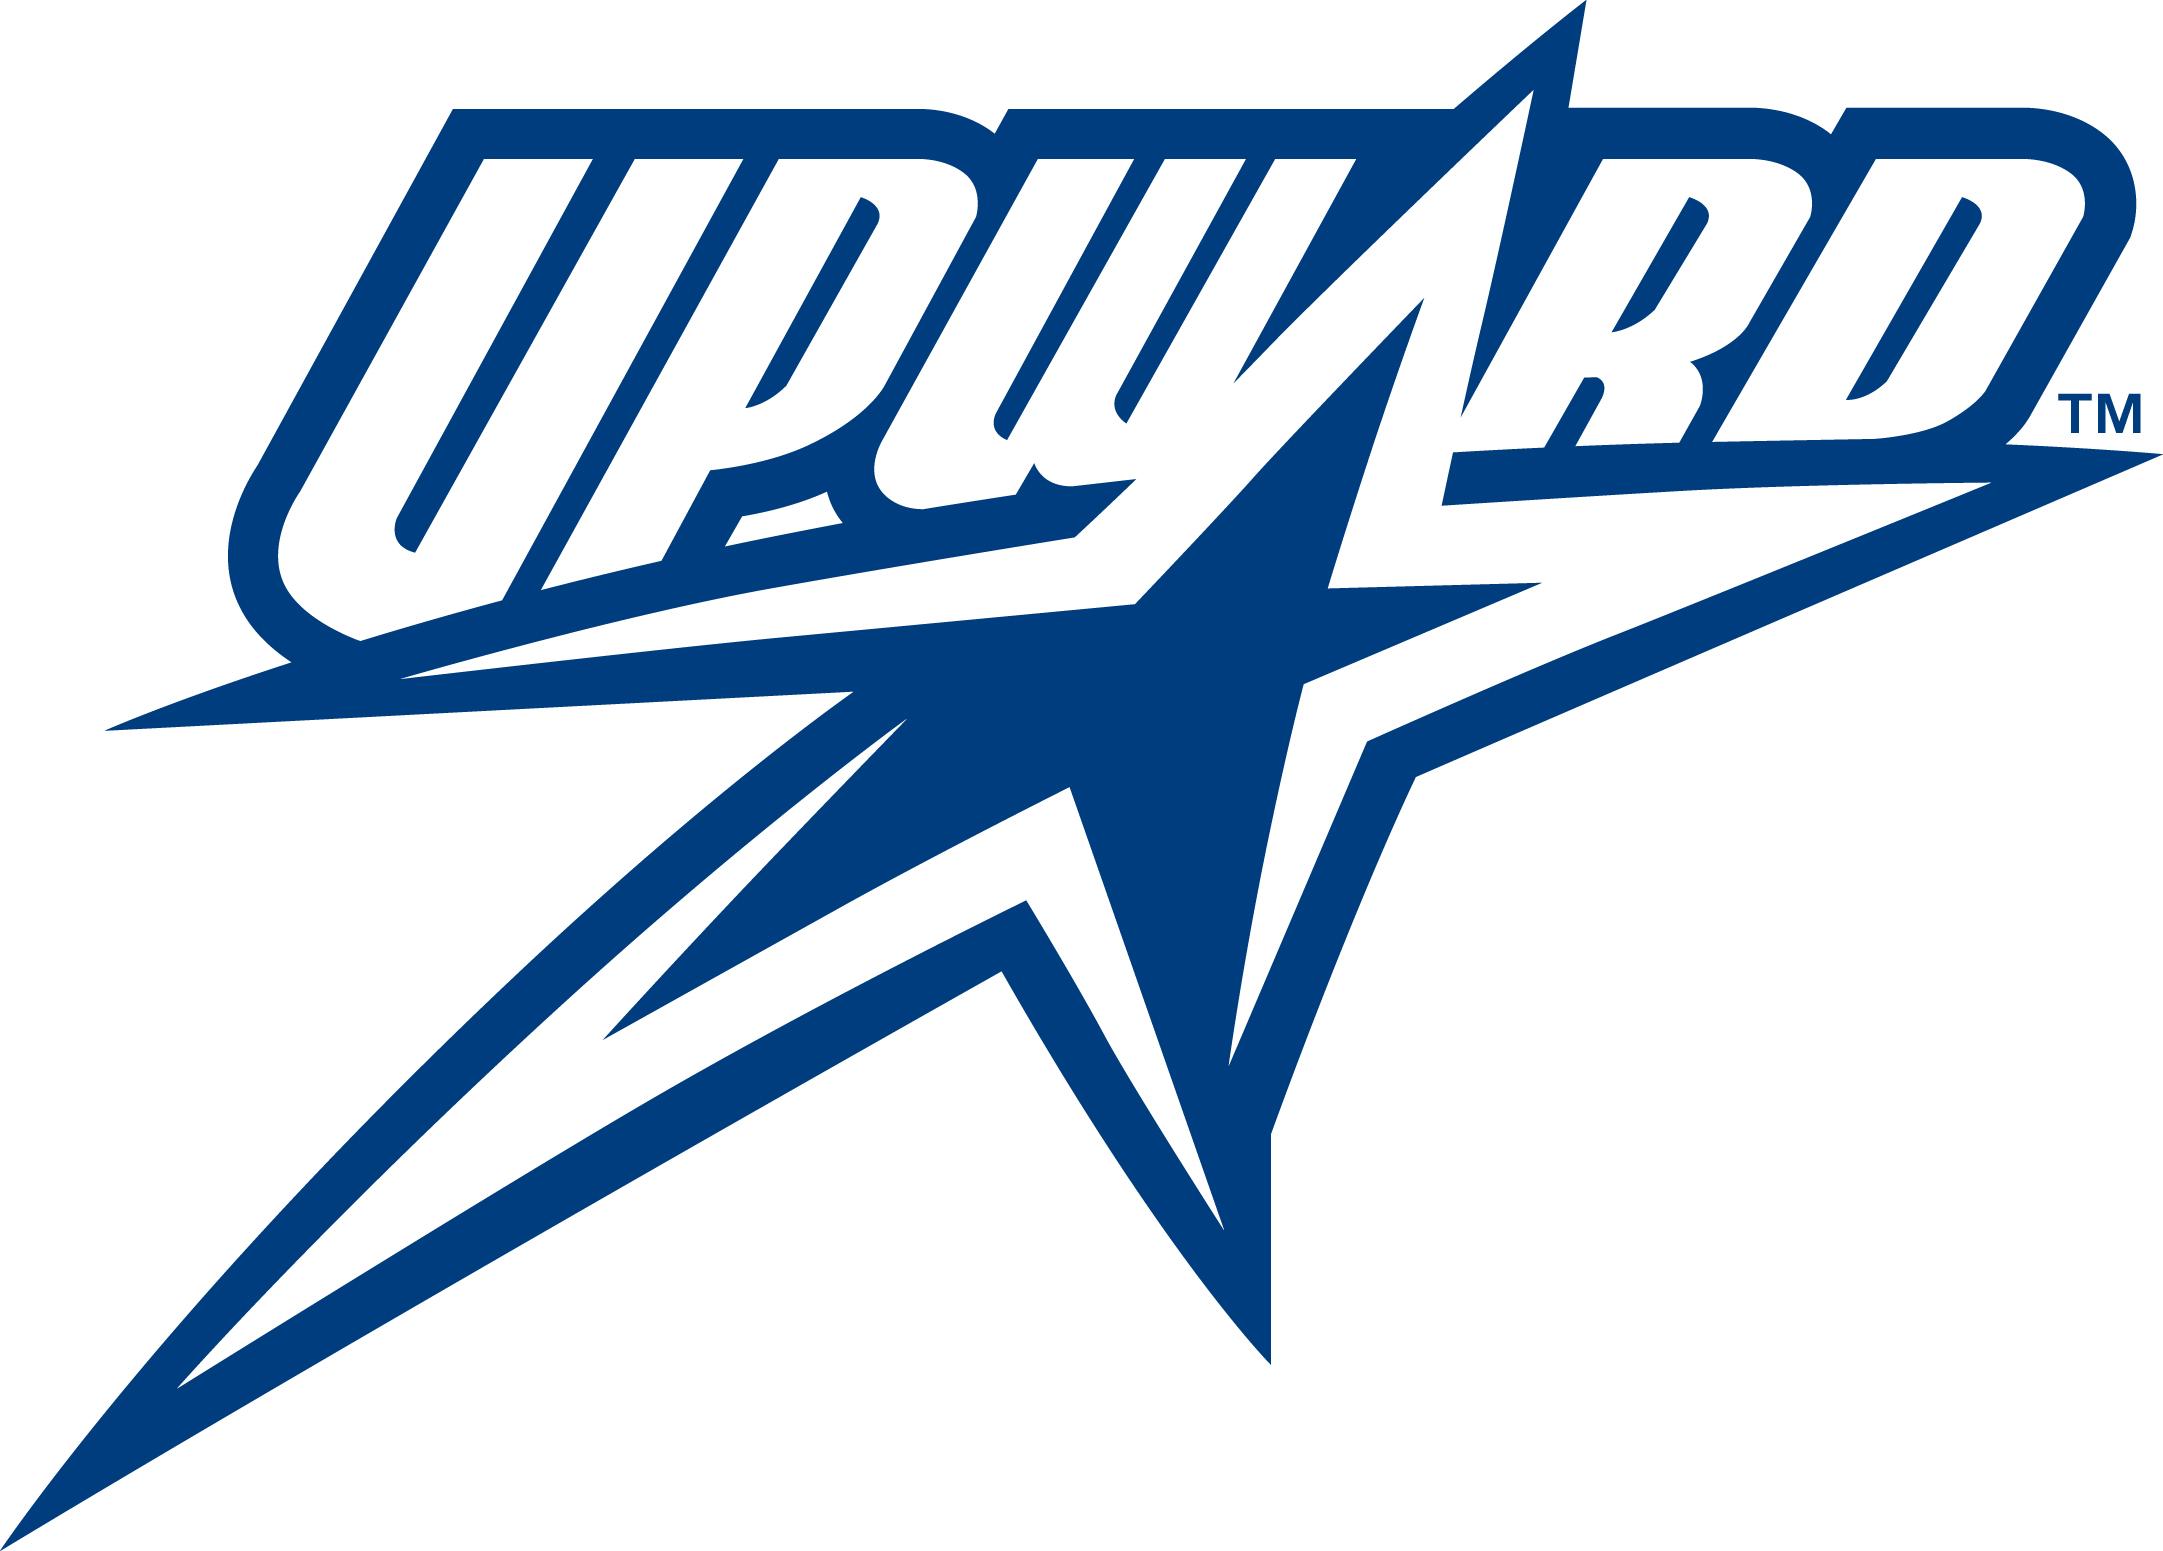 Upward sports flag football clipart.